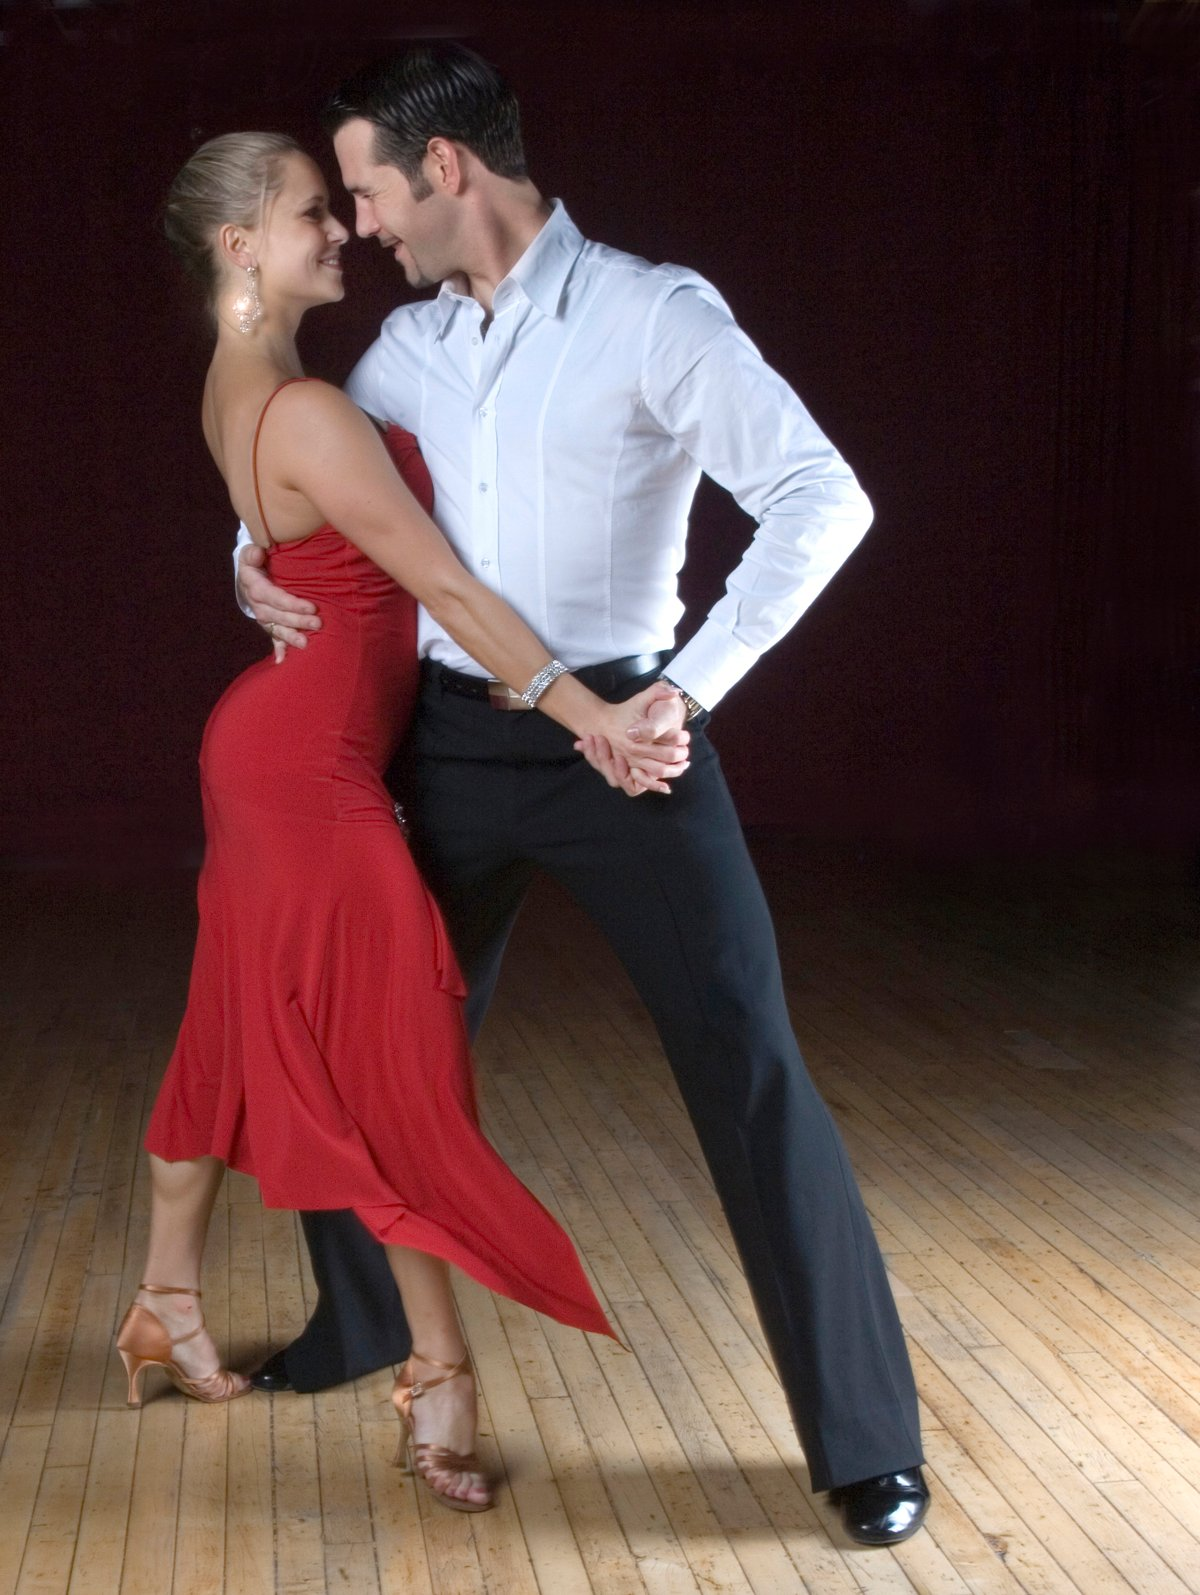 Asi me gusta bailar sobre una pija - 3 part 1